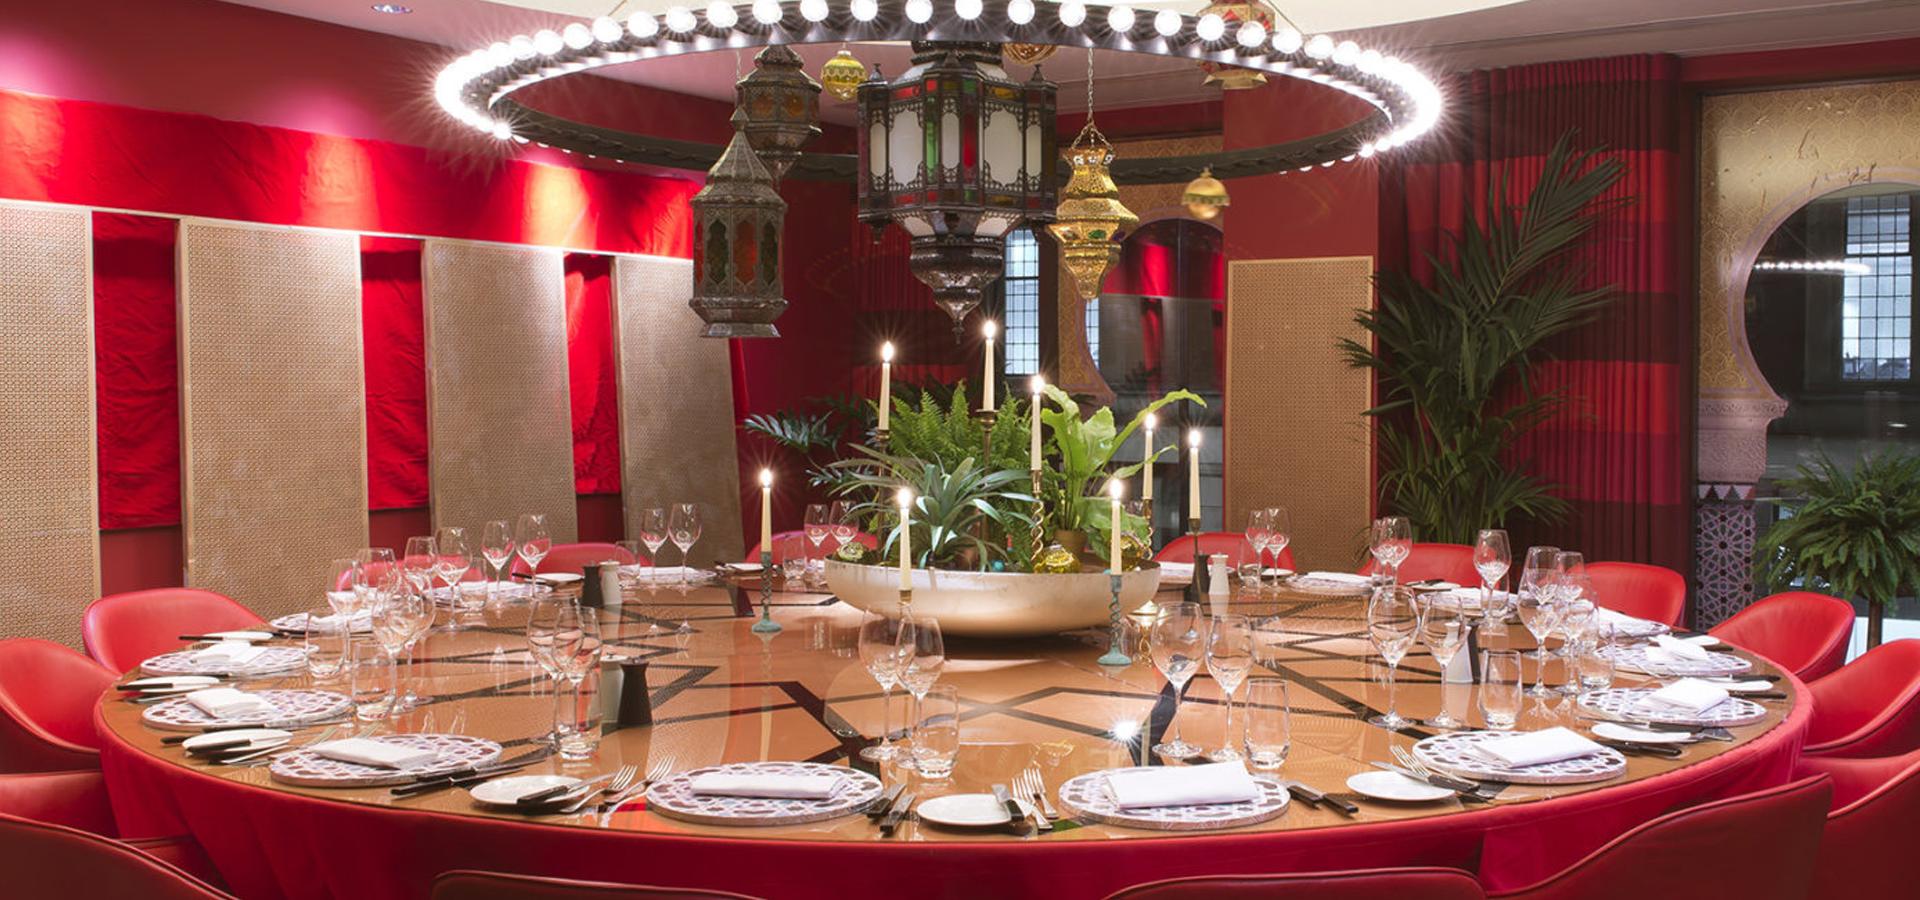 South Place Hotel - Kiryakin Room